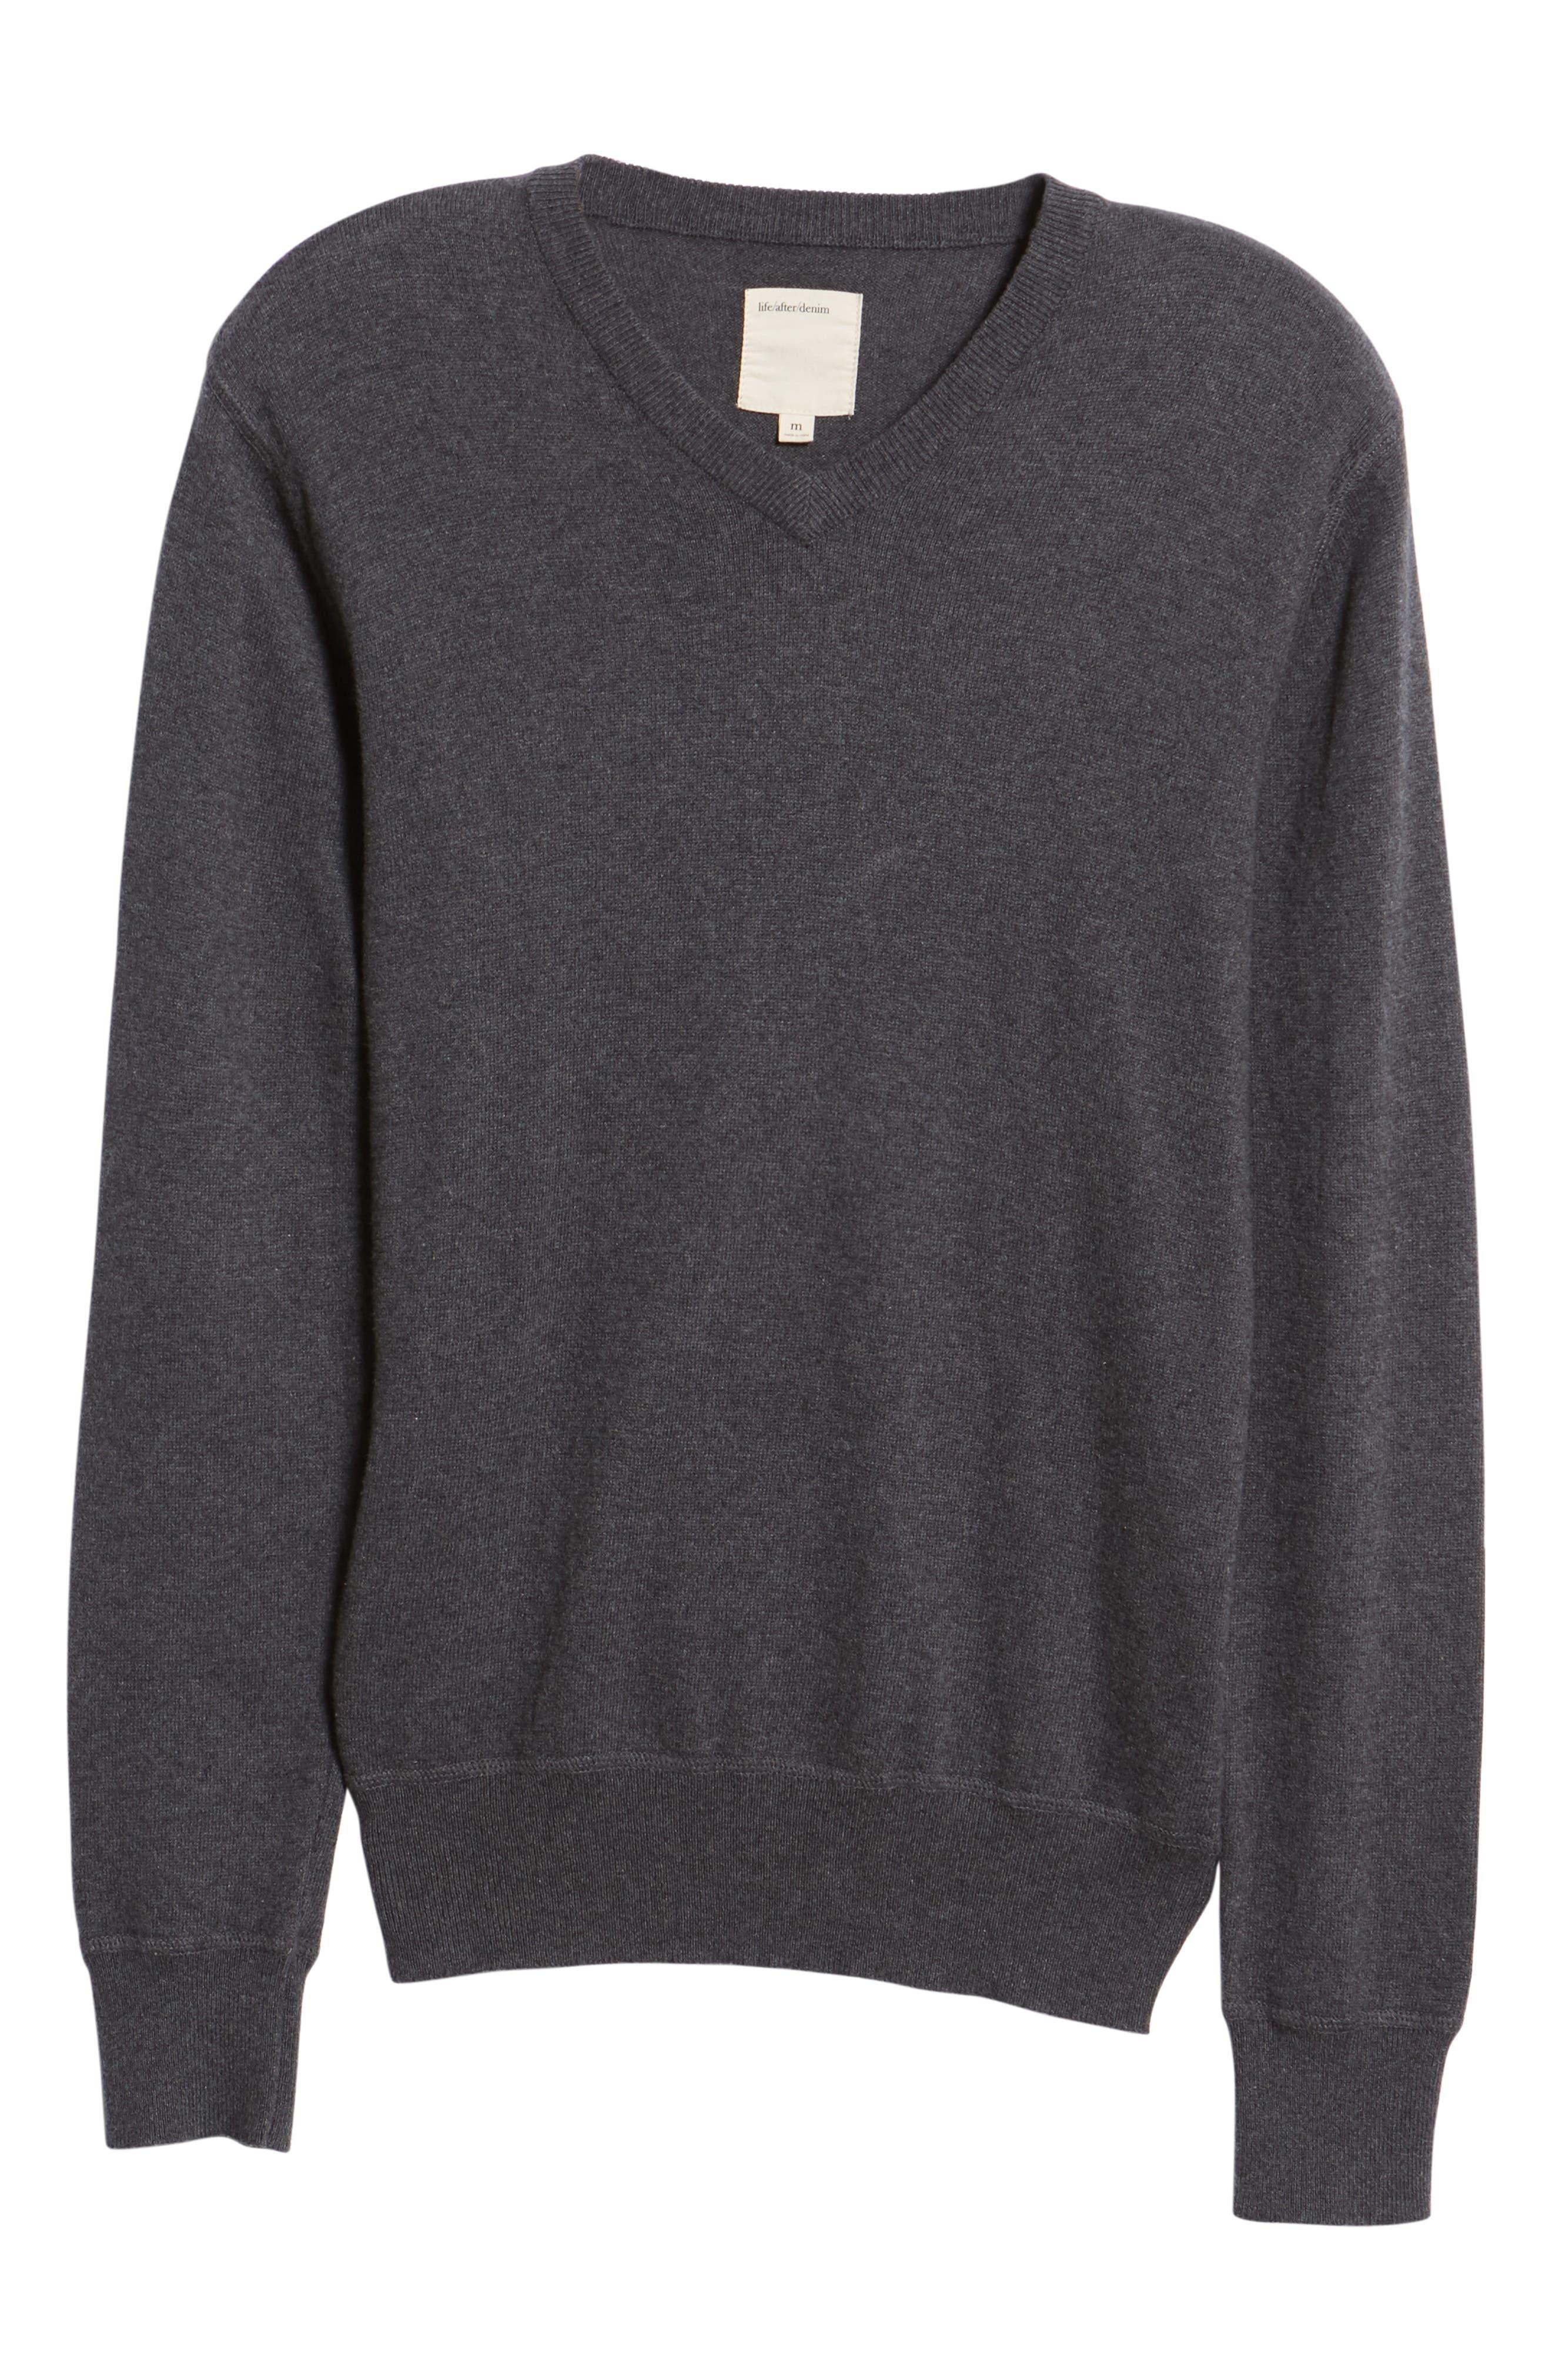 Tournament Slim Fit V-Neck Sweater,                             Alternate thumbnail 6, color,                             HEATHER CHARCOAL